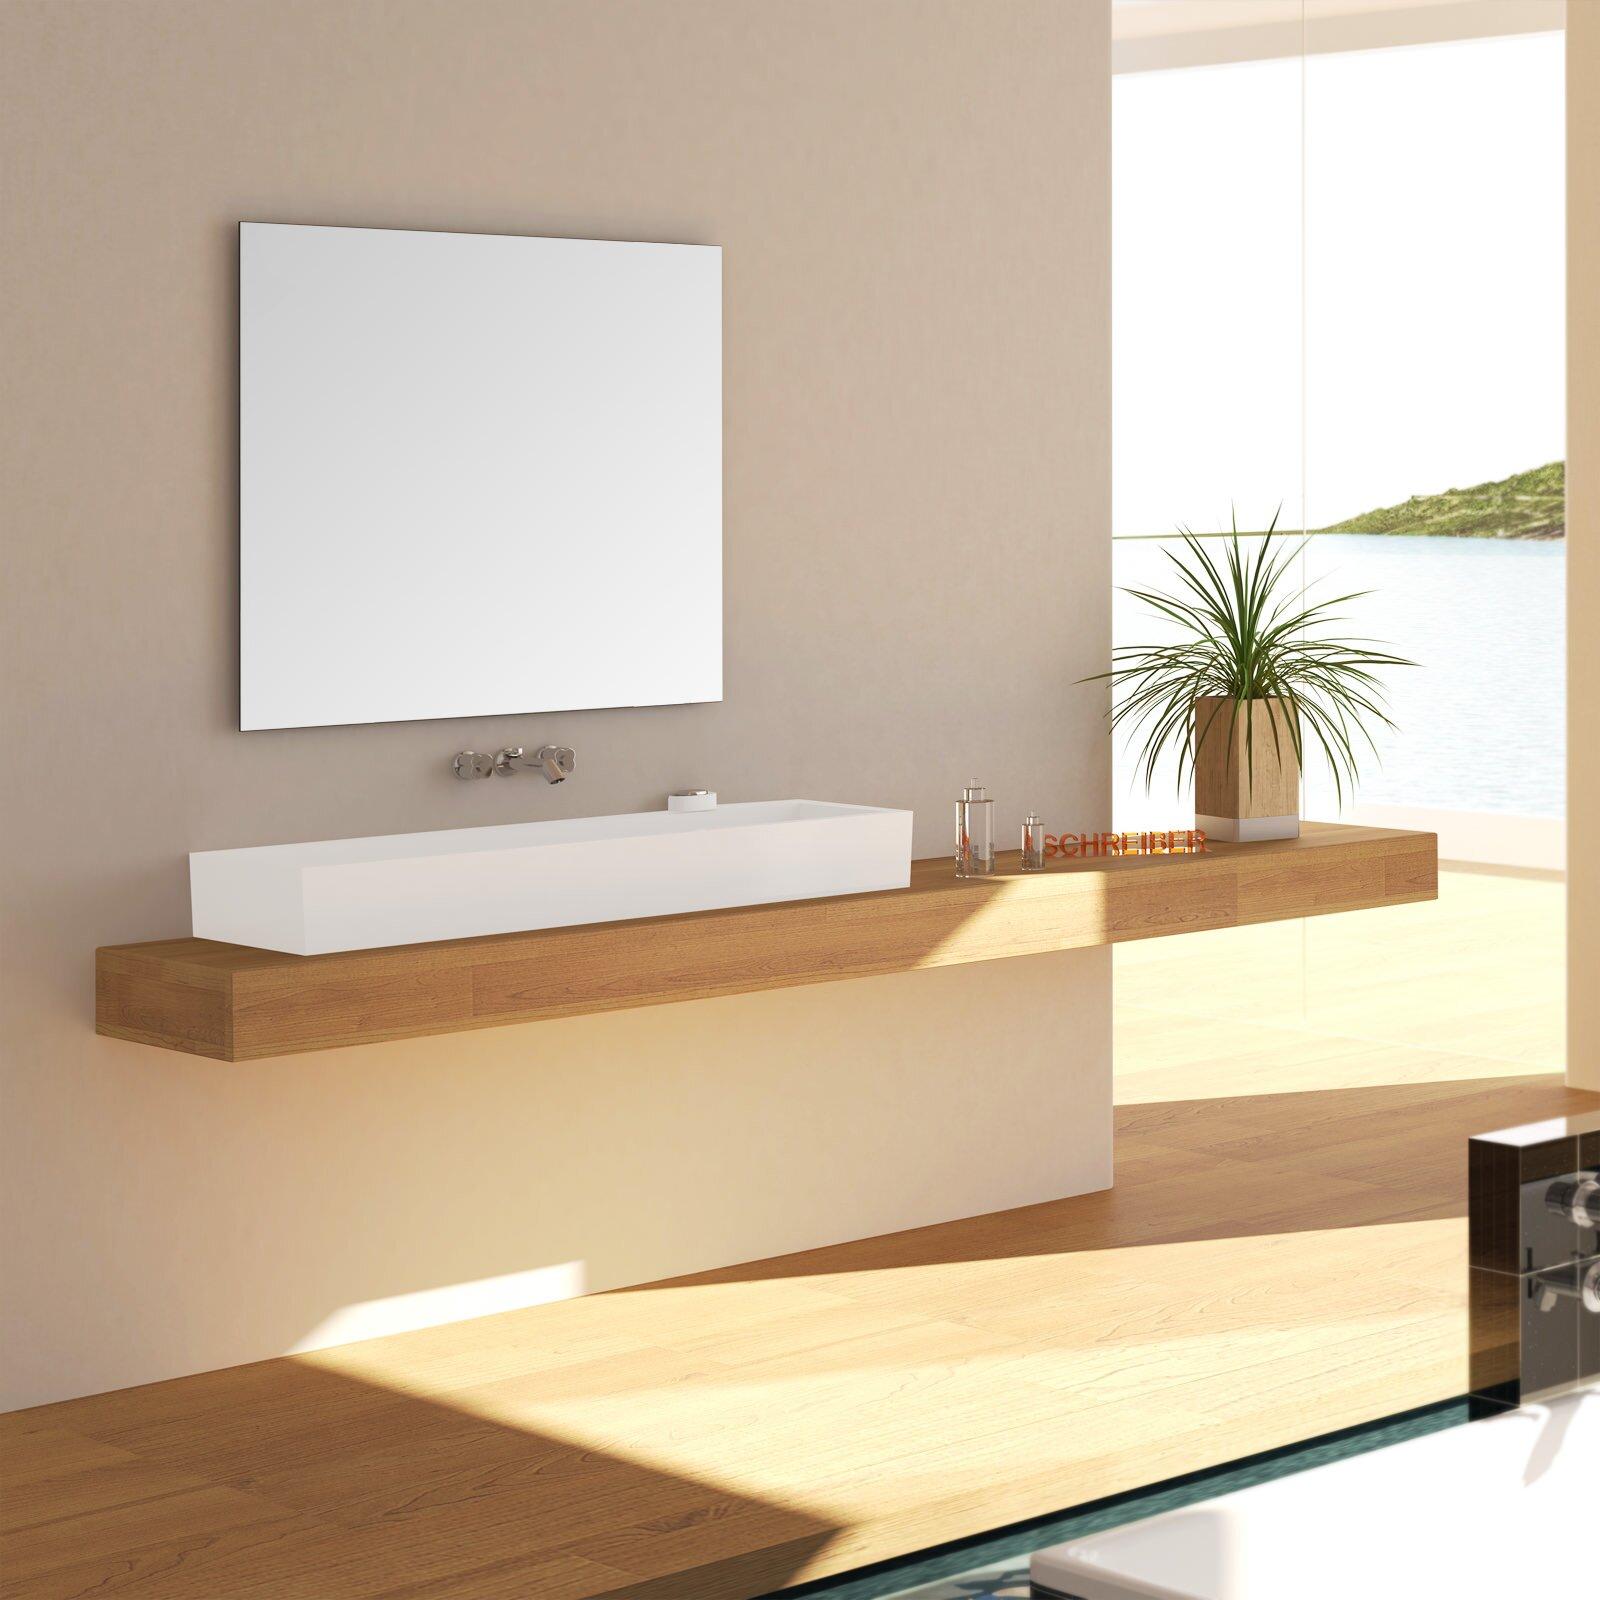 badspiegel basic spiegel nach ma und in 26 standardgr en top qualit t 39 00. Black Bedroom Furniture Sets. Home Design Ideas